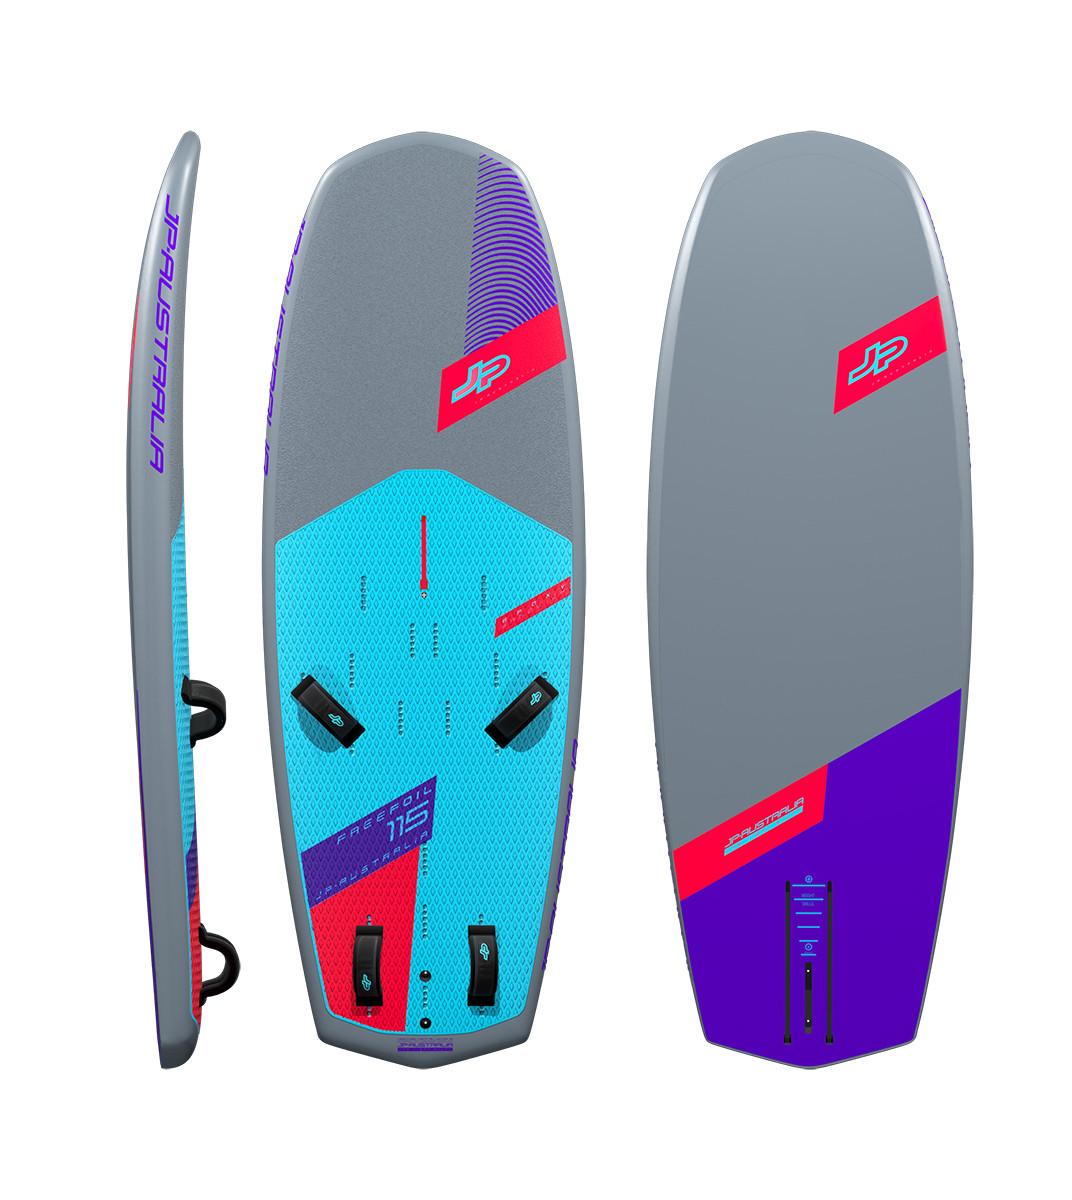 JP Australia Windsurfboard Freefoil ES 2021